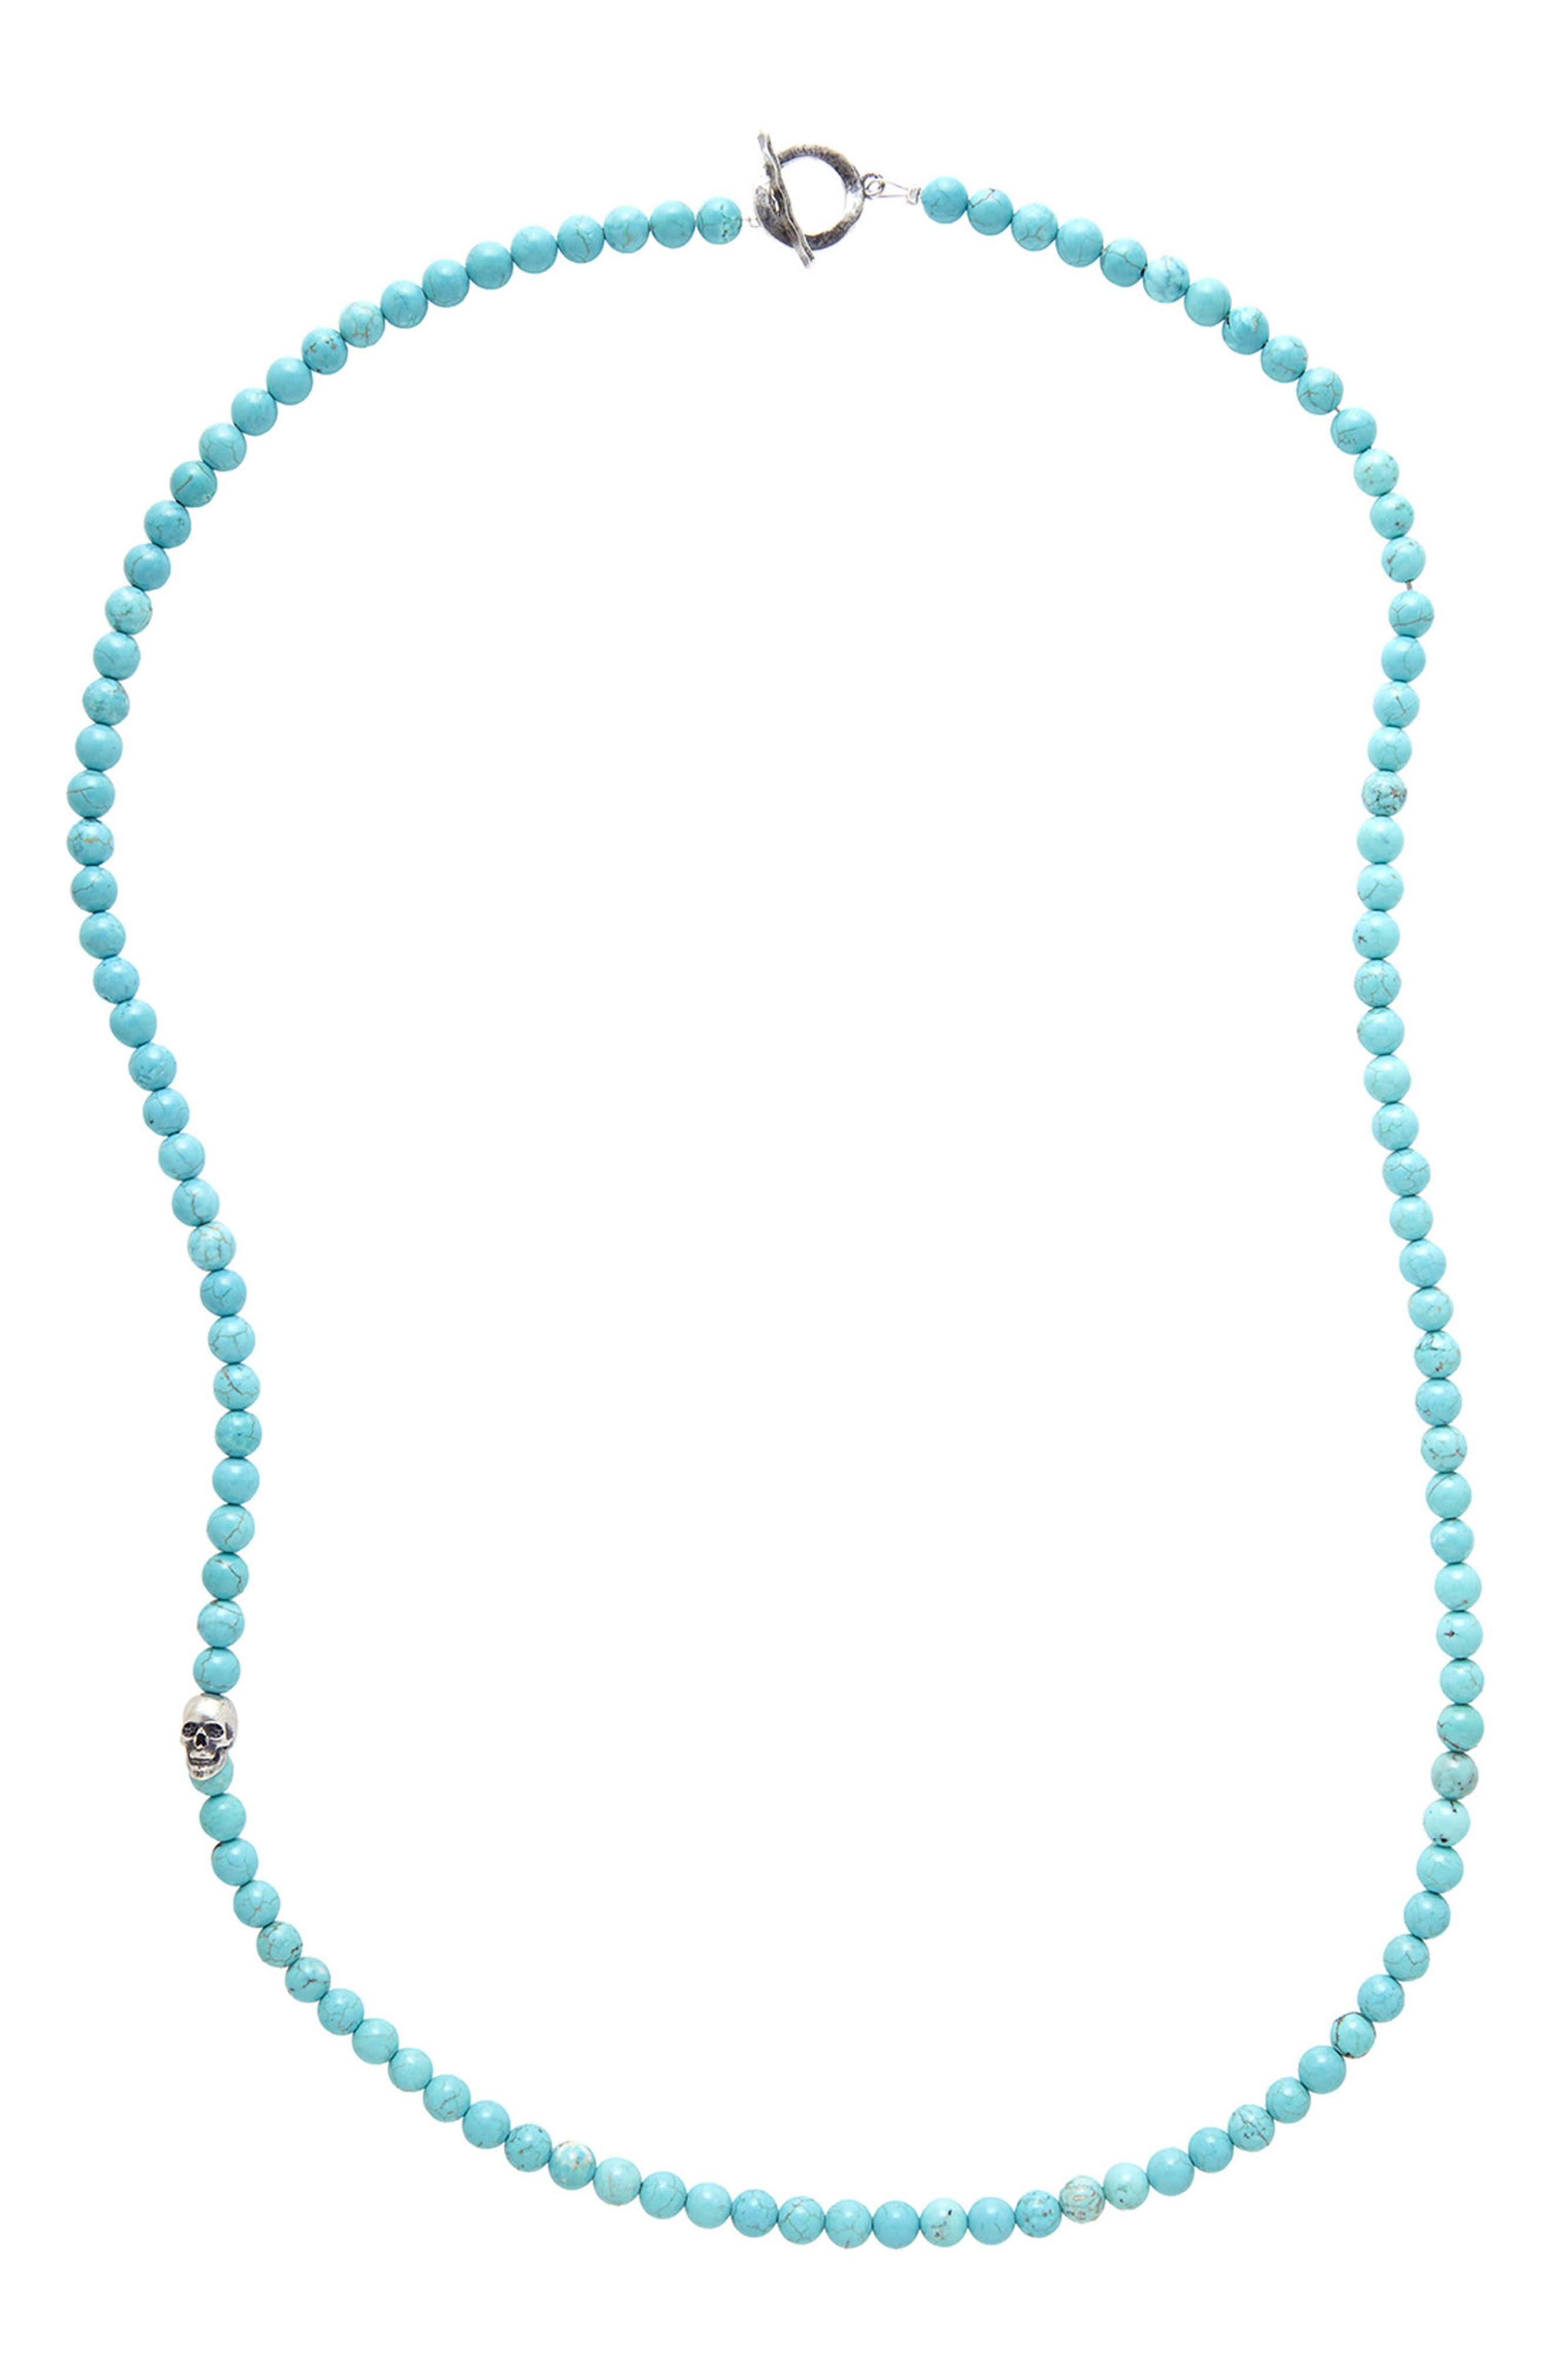 Degs & Sal Turquoise Bead Necklace